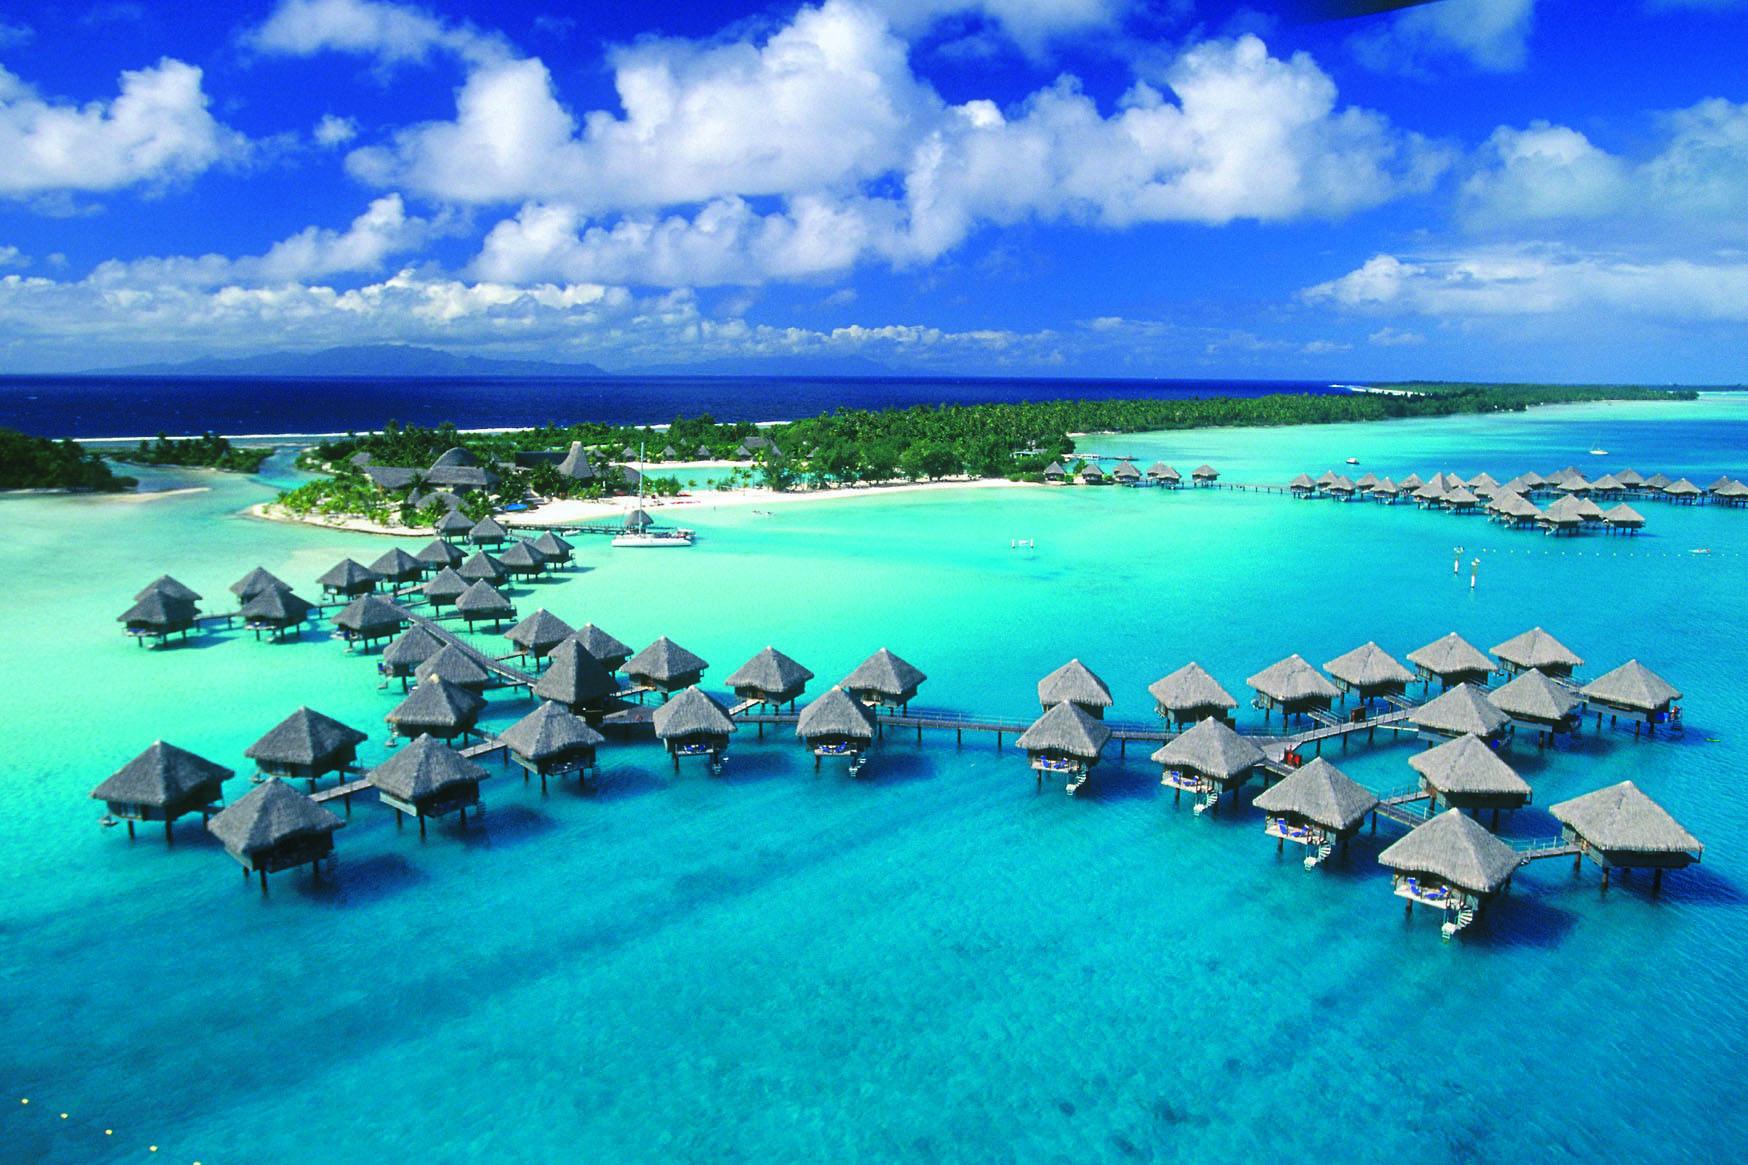 Vuelos a Bora Bora - Billetes de la Reserva baratos a Bora Bora, Polinesia Francesa